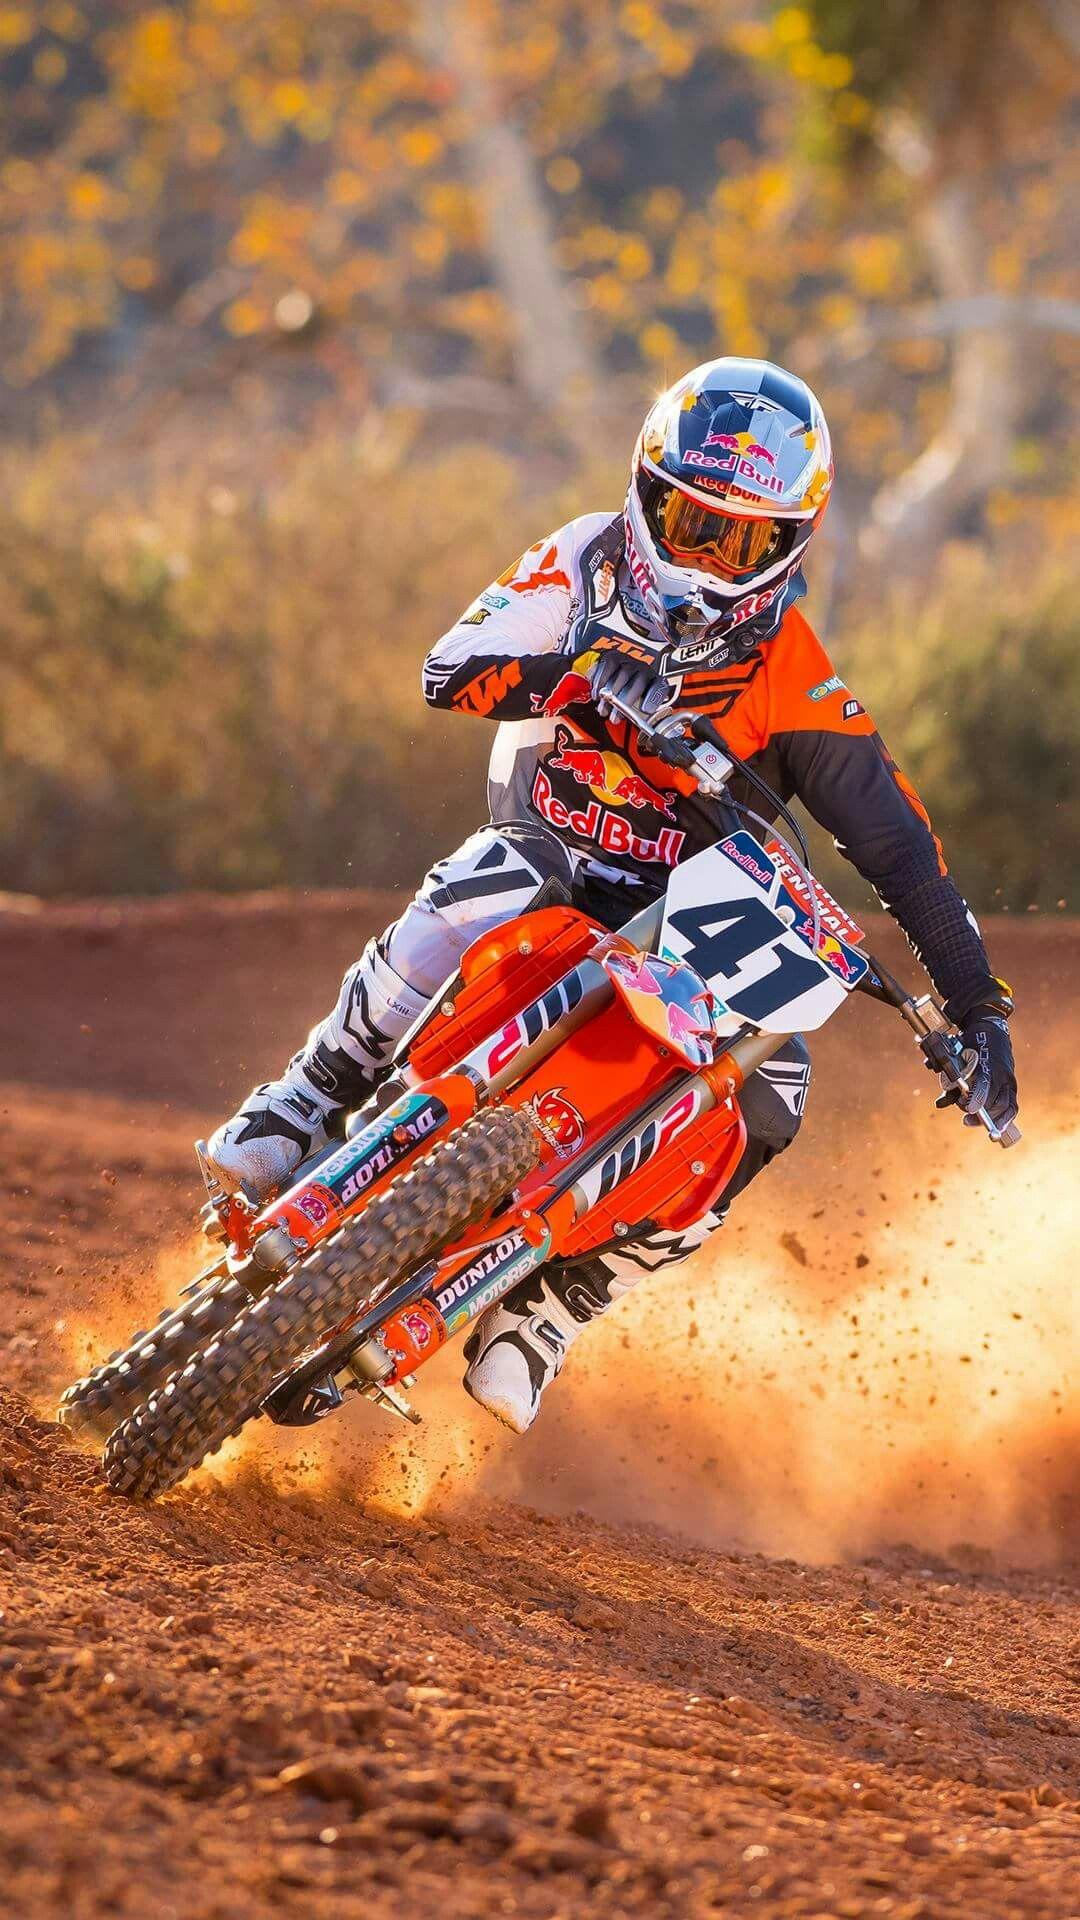 Épinglé par Fußballstern sur Motocross | Fond d'écran moto cross, Motocross, Supermotard